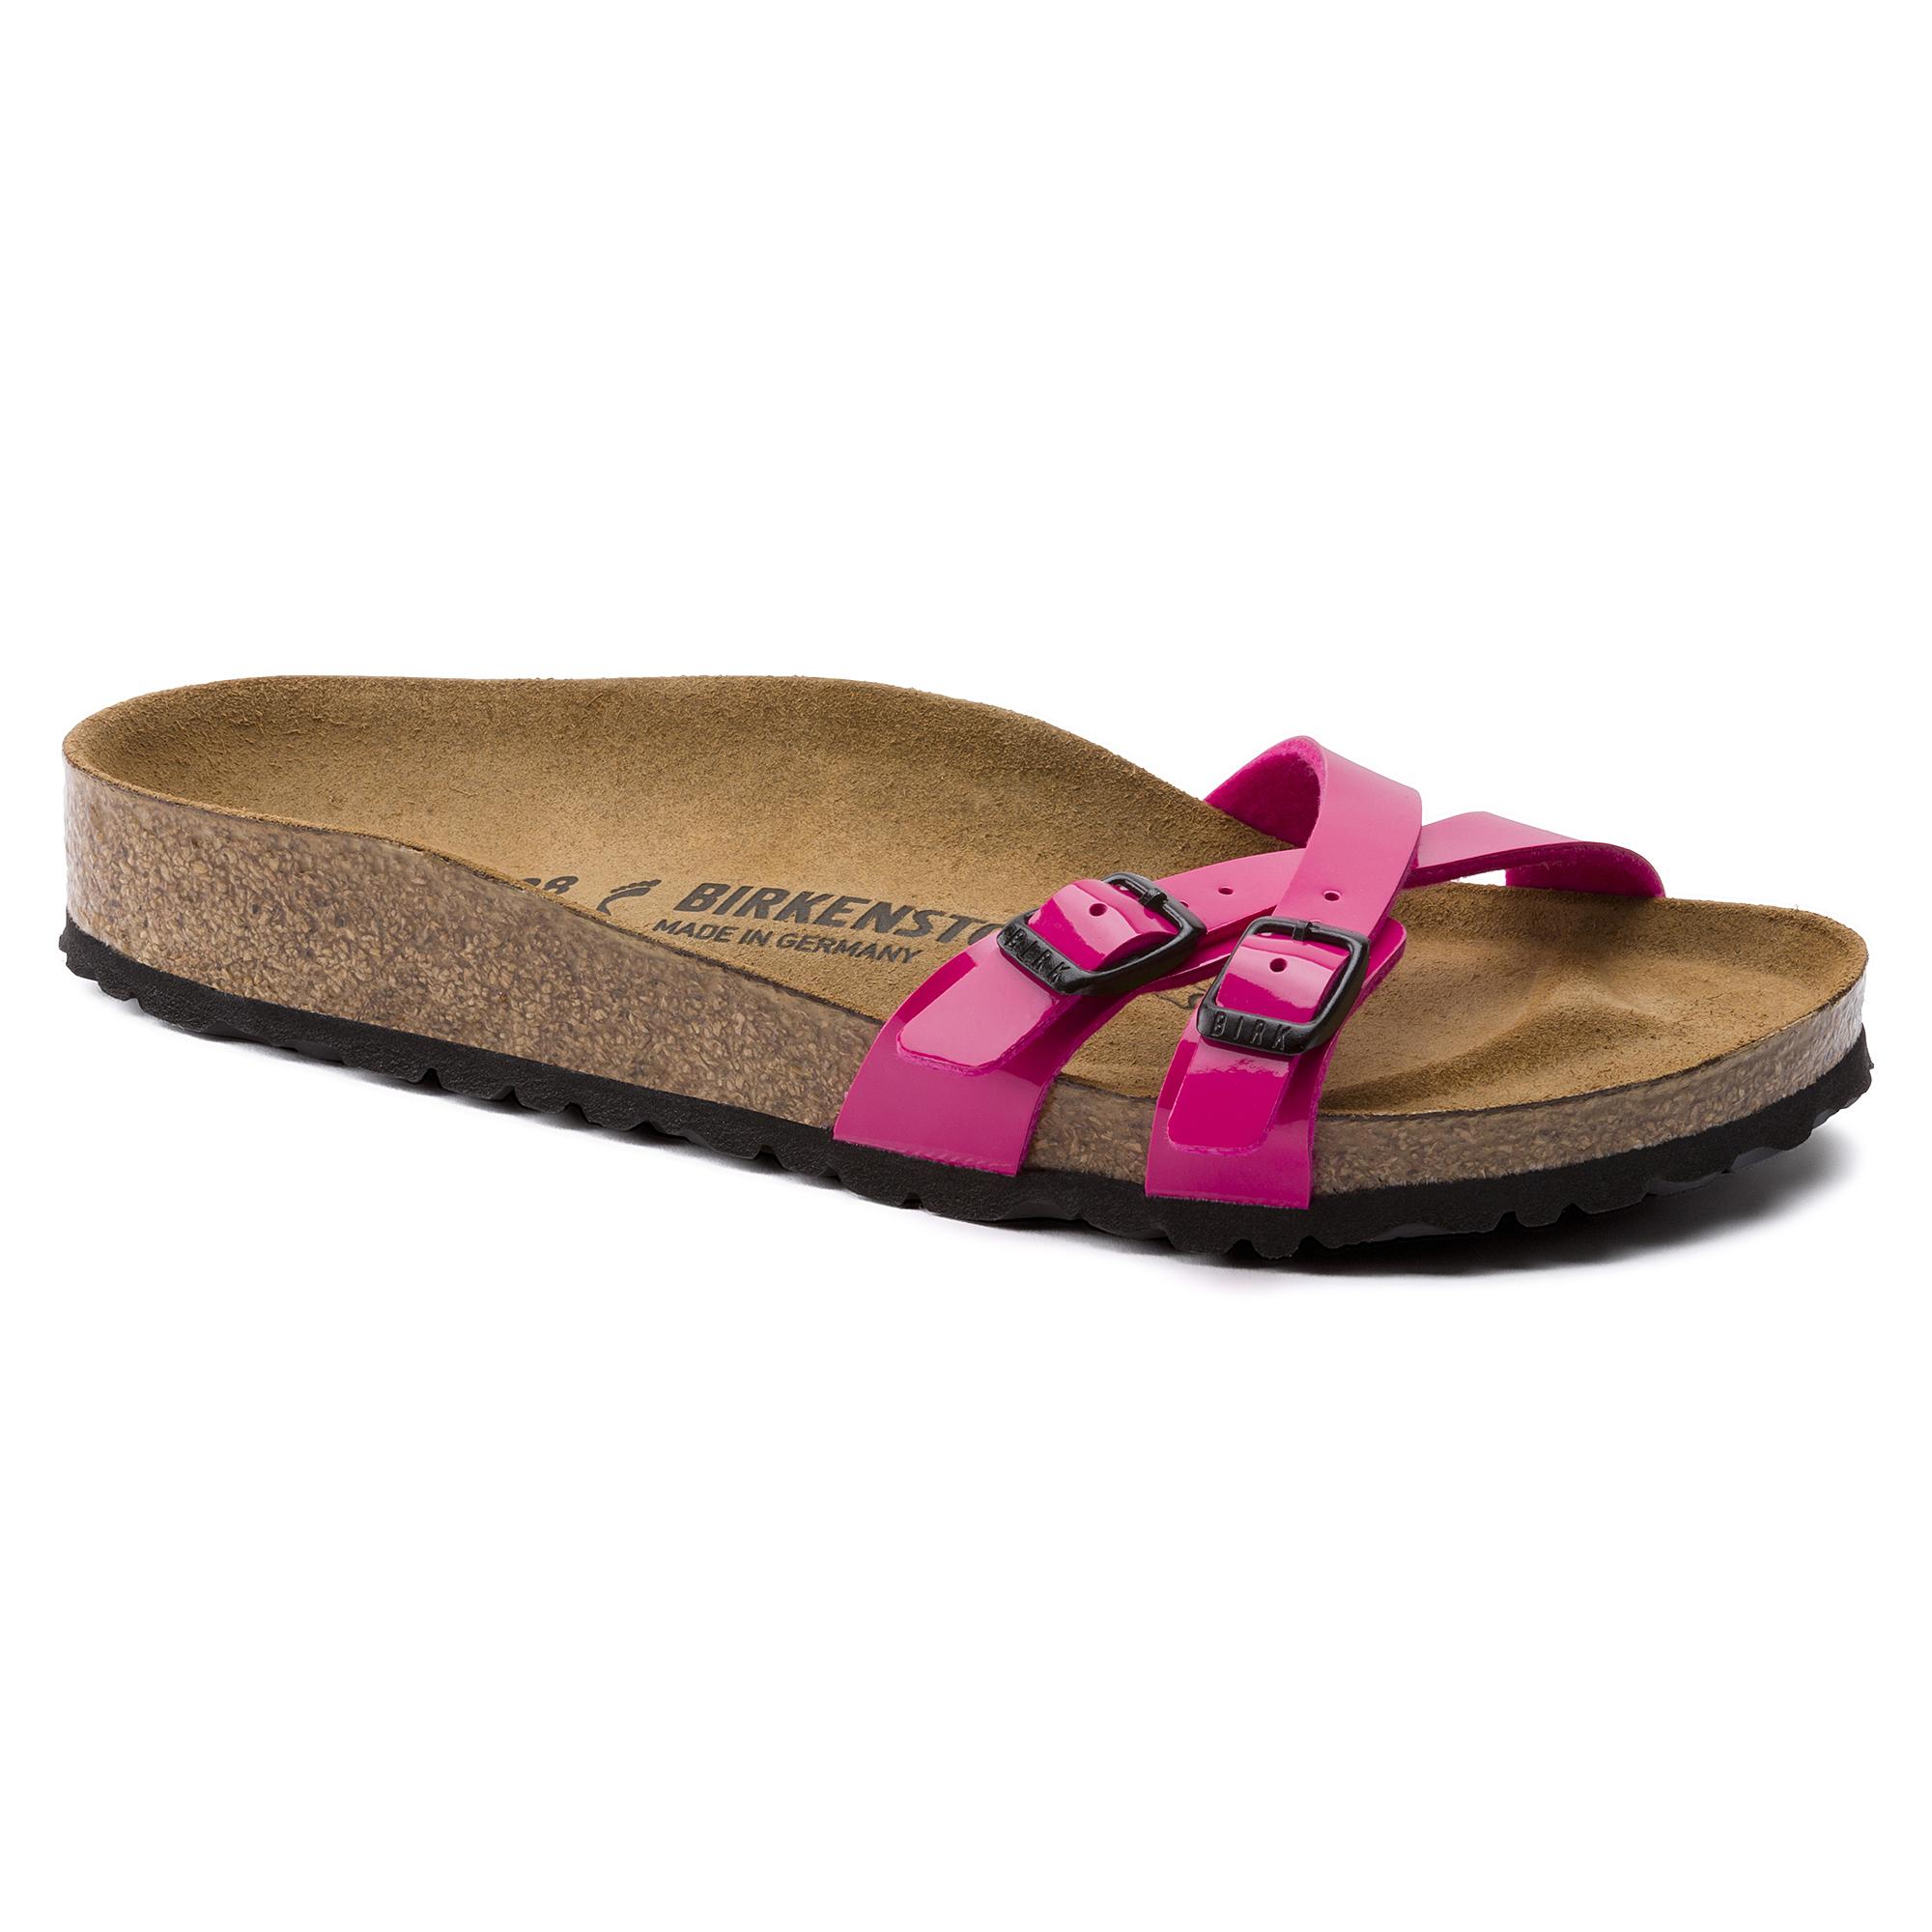 Gress Schuh GmbH veganske Birkenstock | Vegan sandals